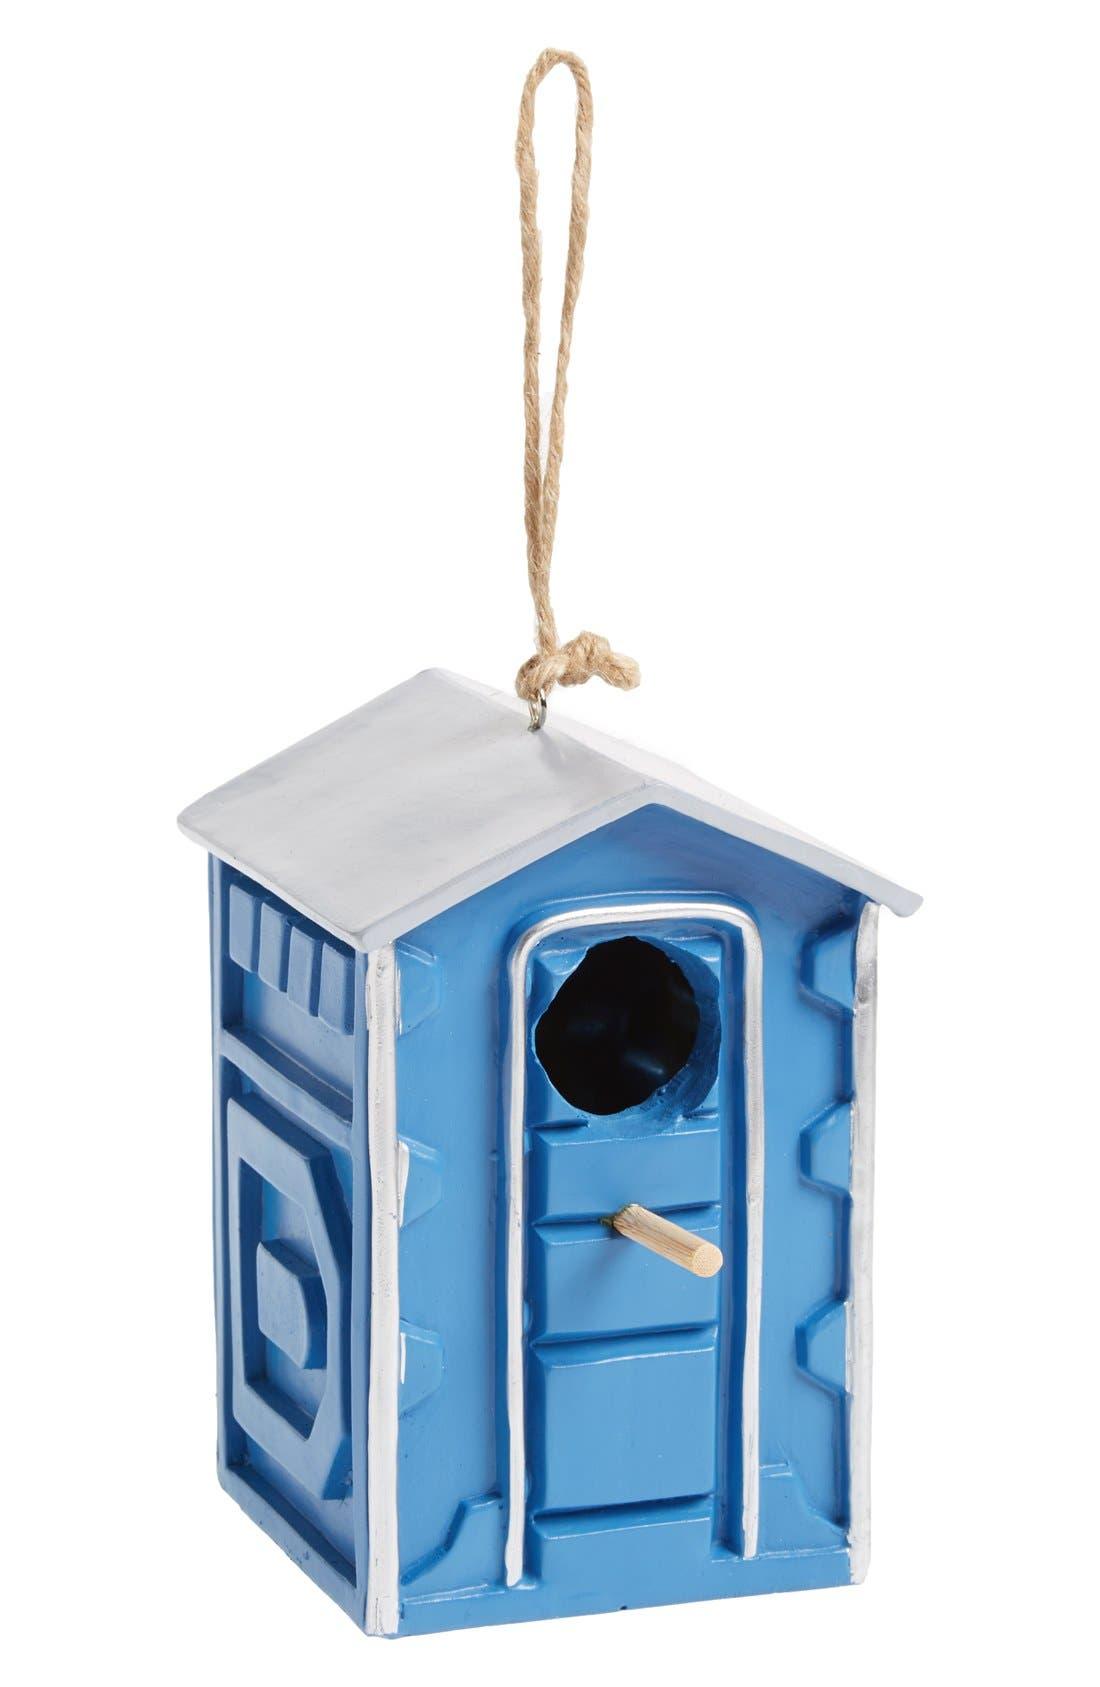 Main Image - Big Mouth Toys 'Portable Potty' Birdhouse